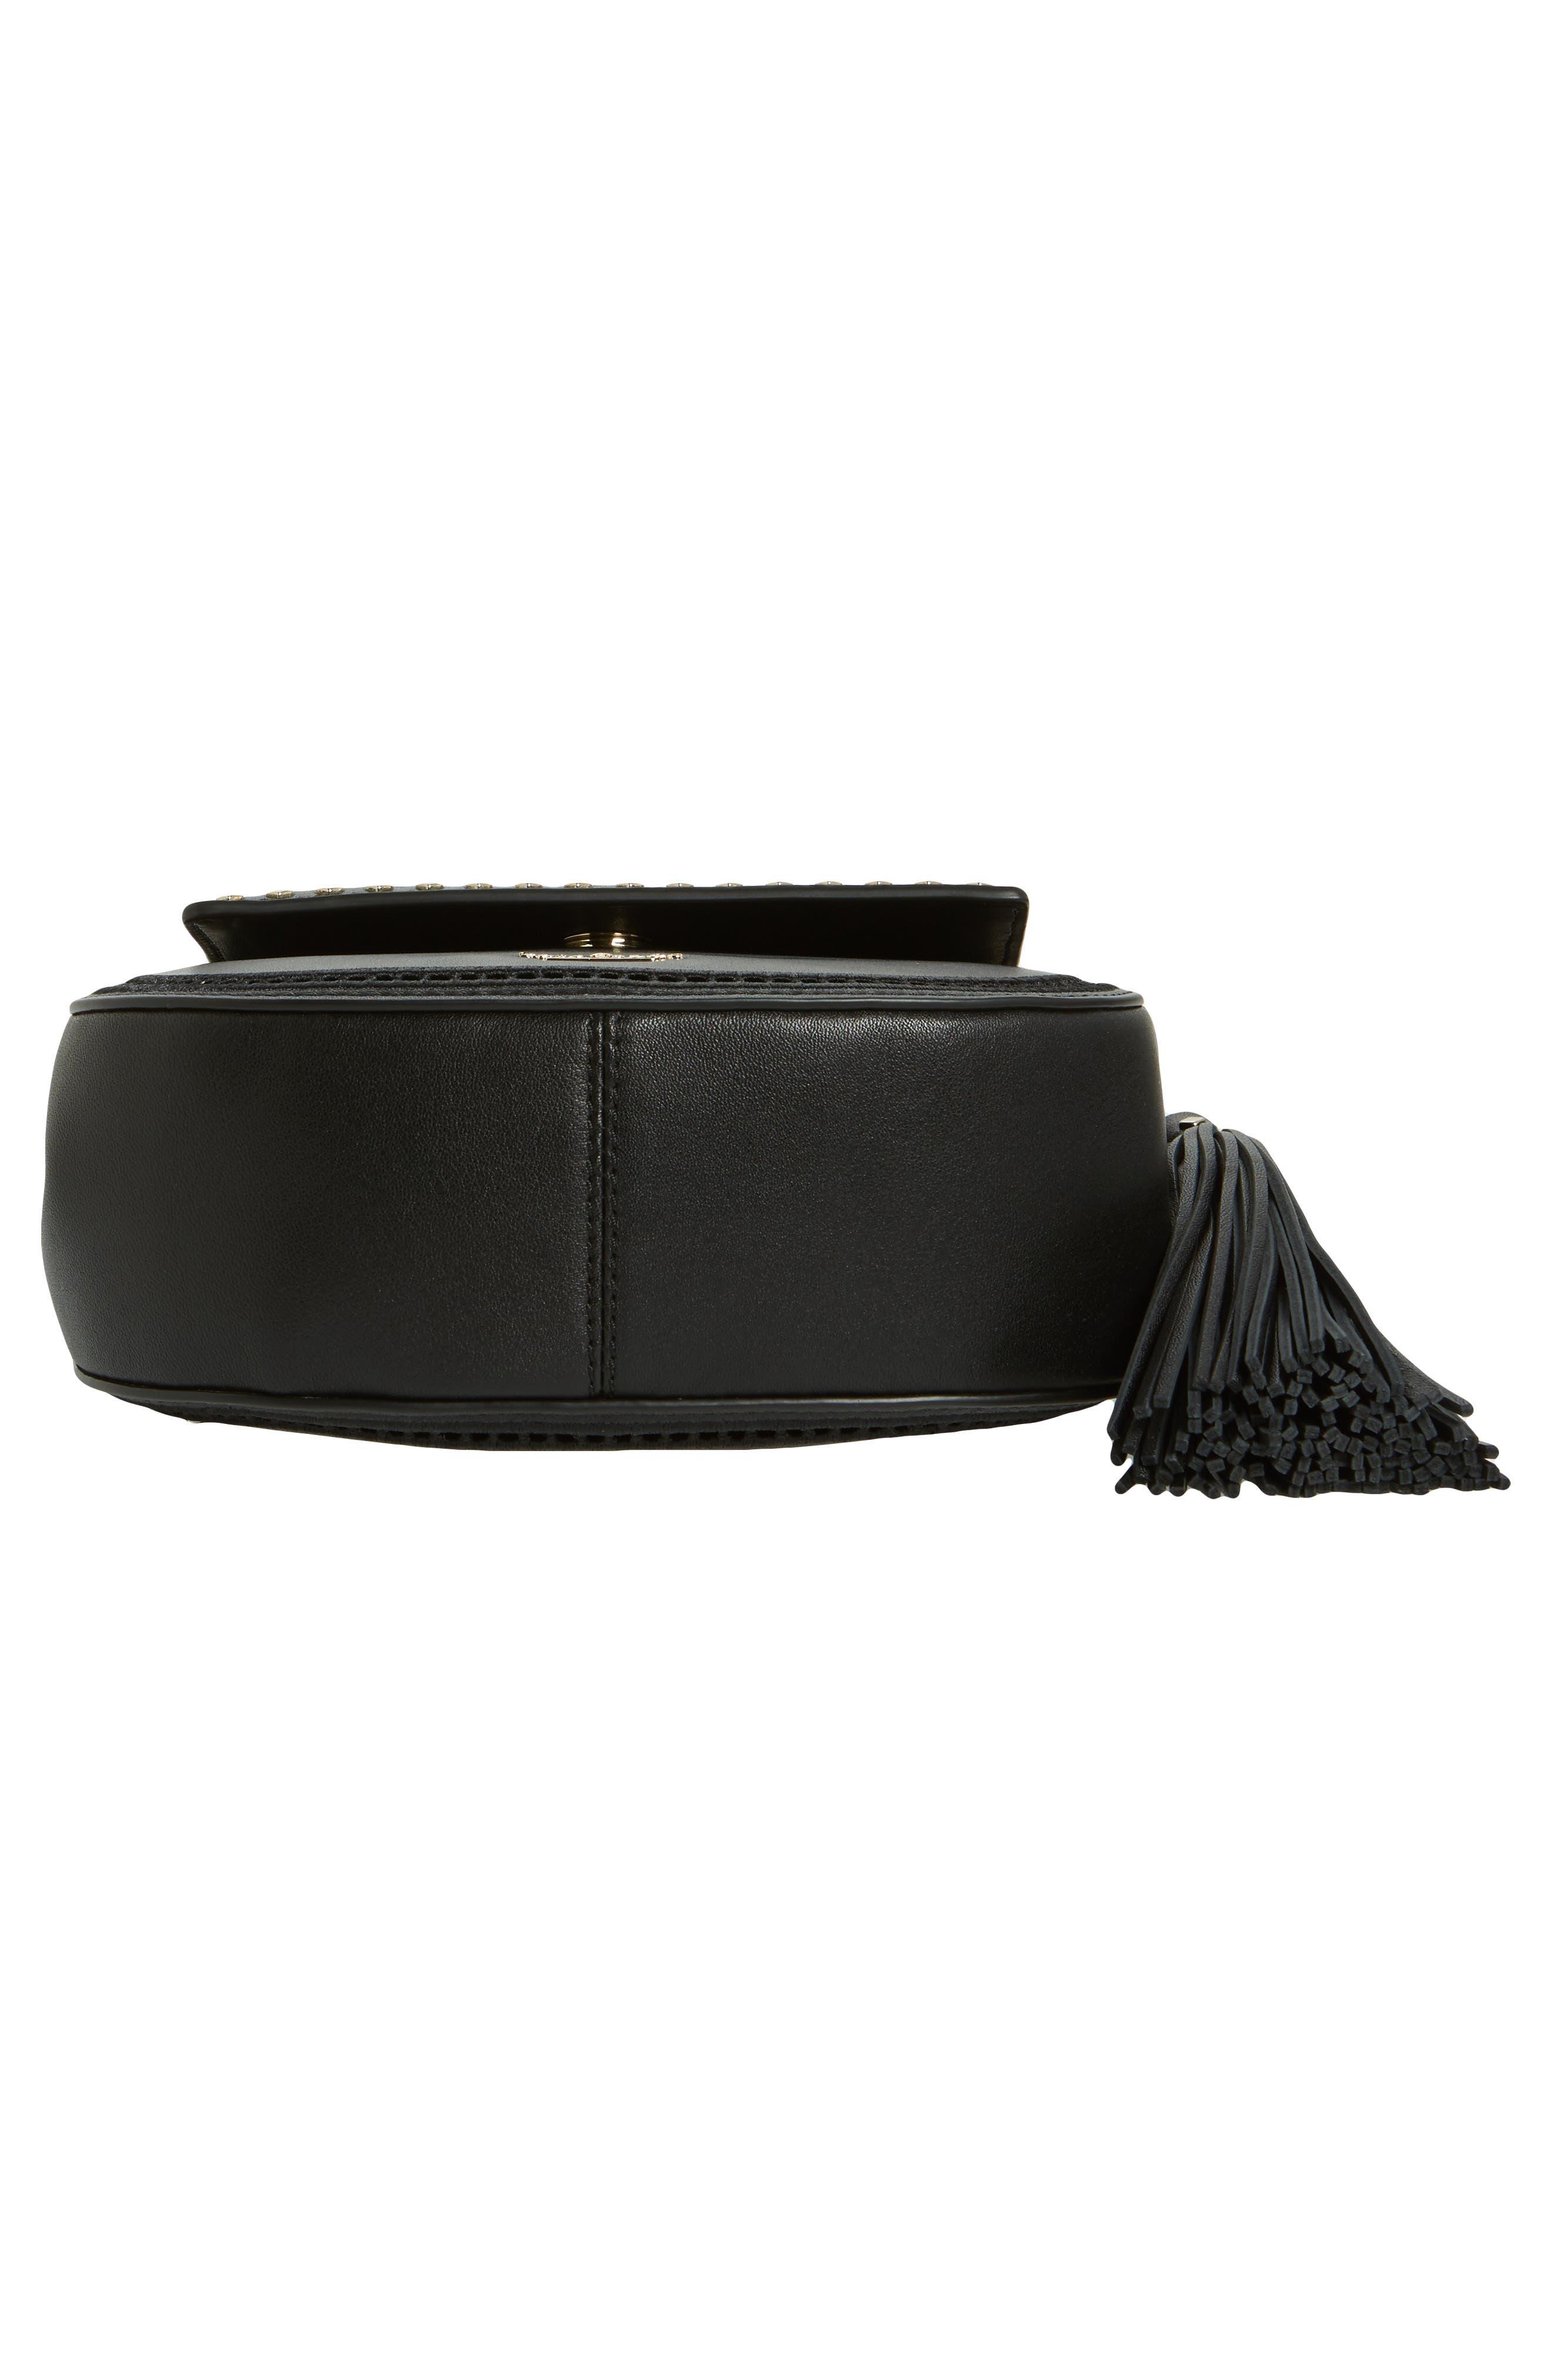 basset lane - small emaline leather crossbody bag,                             Alternate thumbnail 6, color,                             001